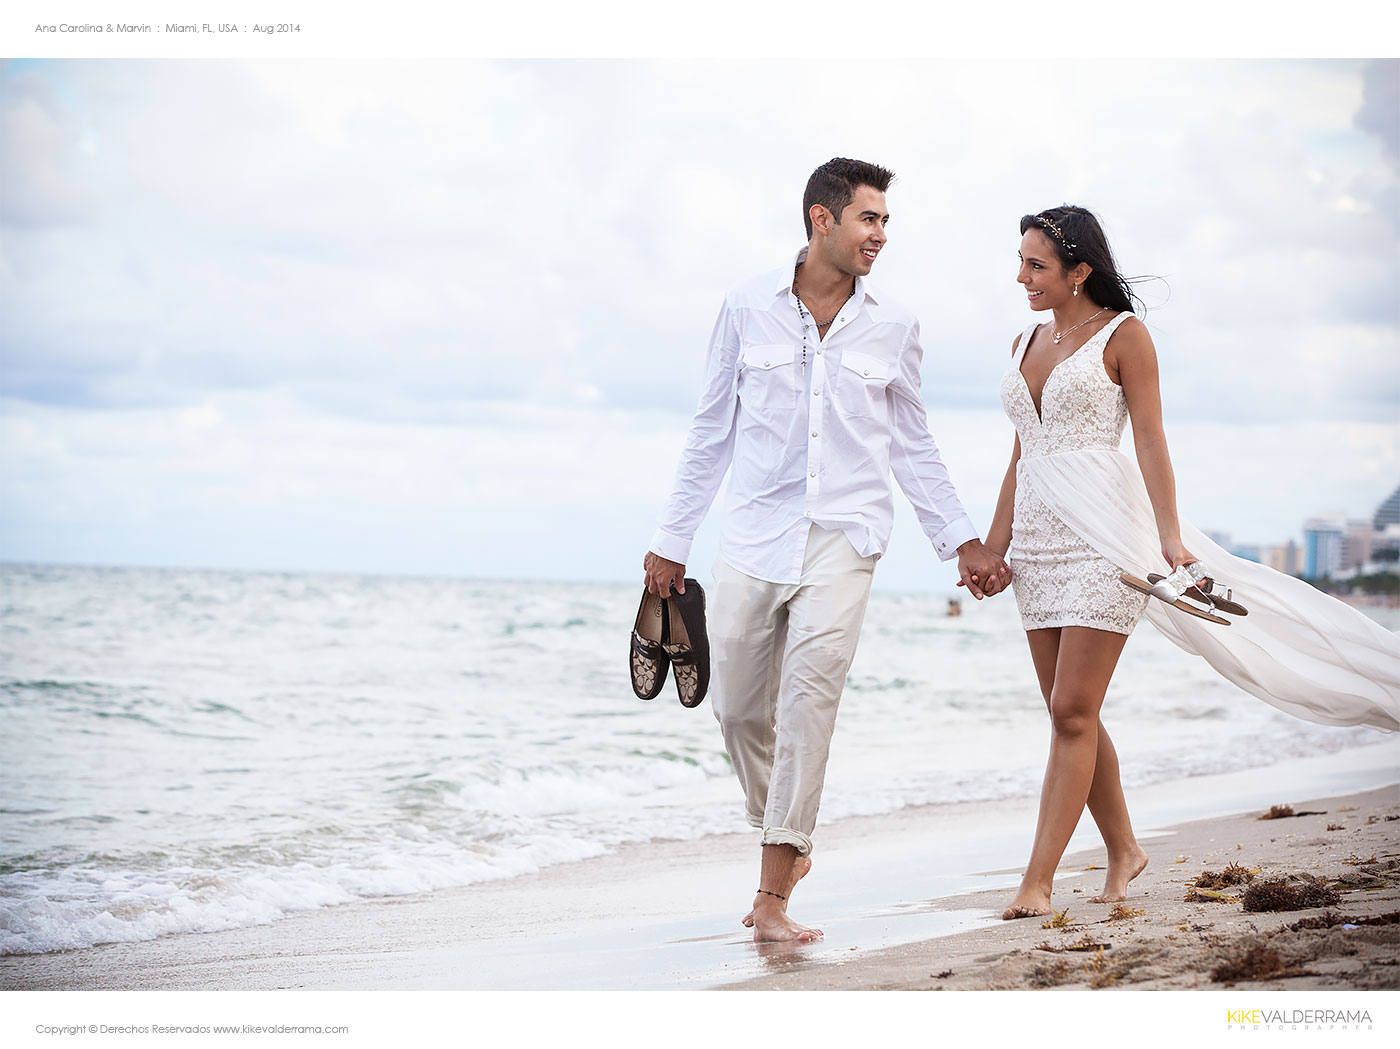 wedding-ana&marvin-by-kike-valderrama-aug2014-115.jpg